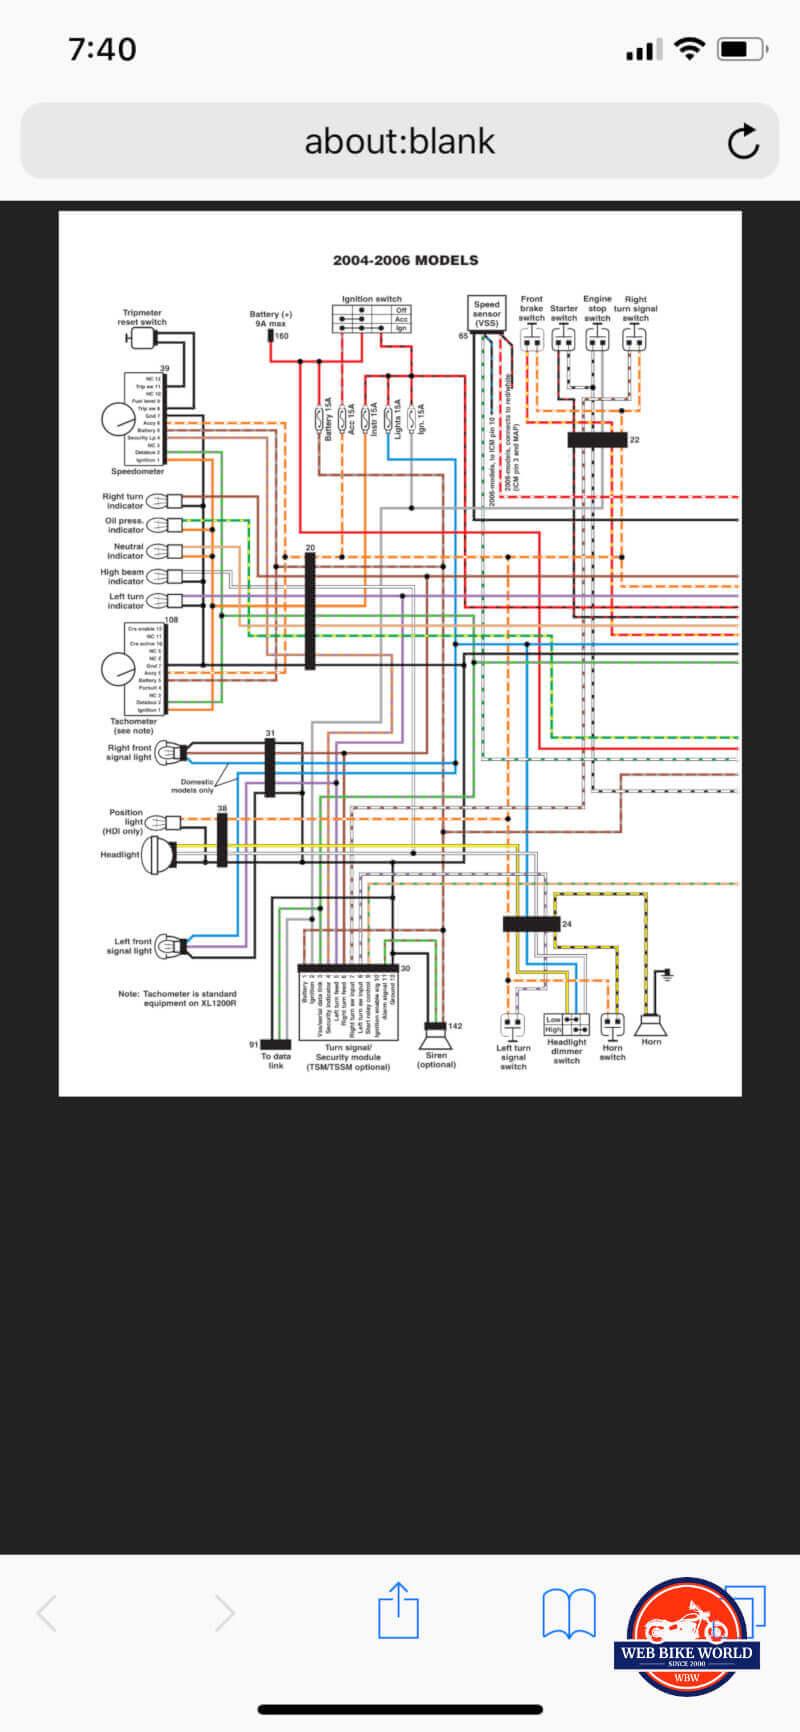 Subaru 1975 Models Wiring Diagrams Online Manual Sharing